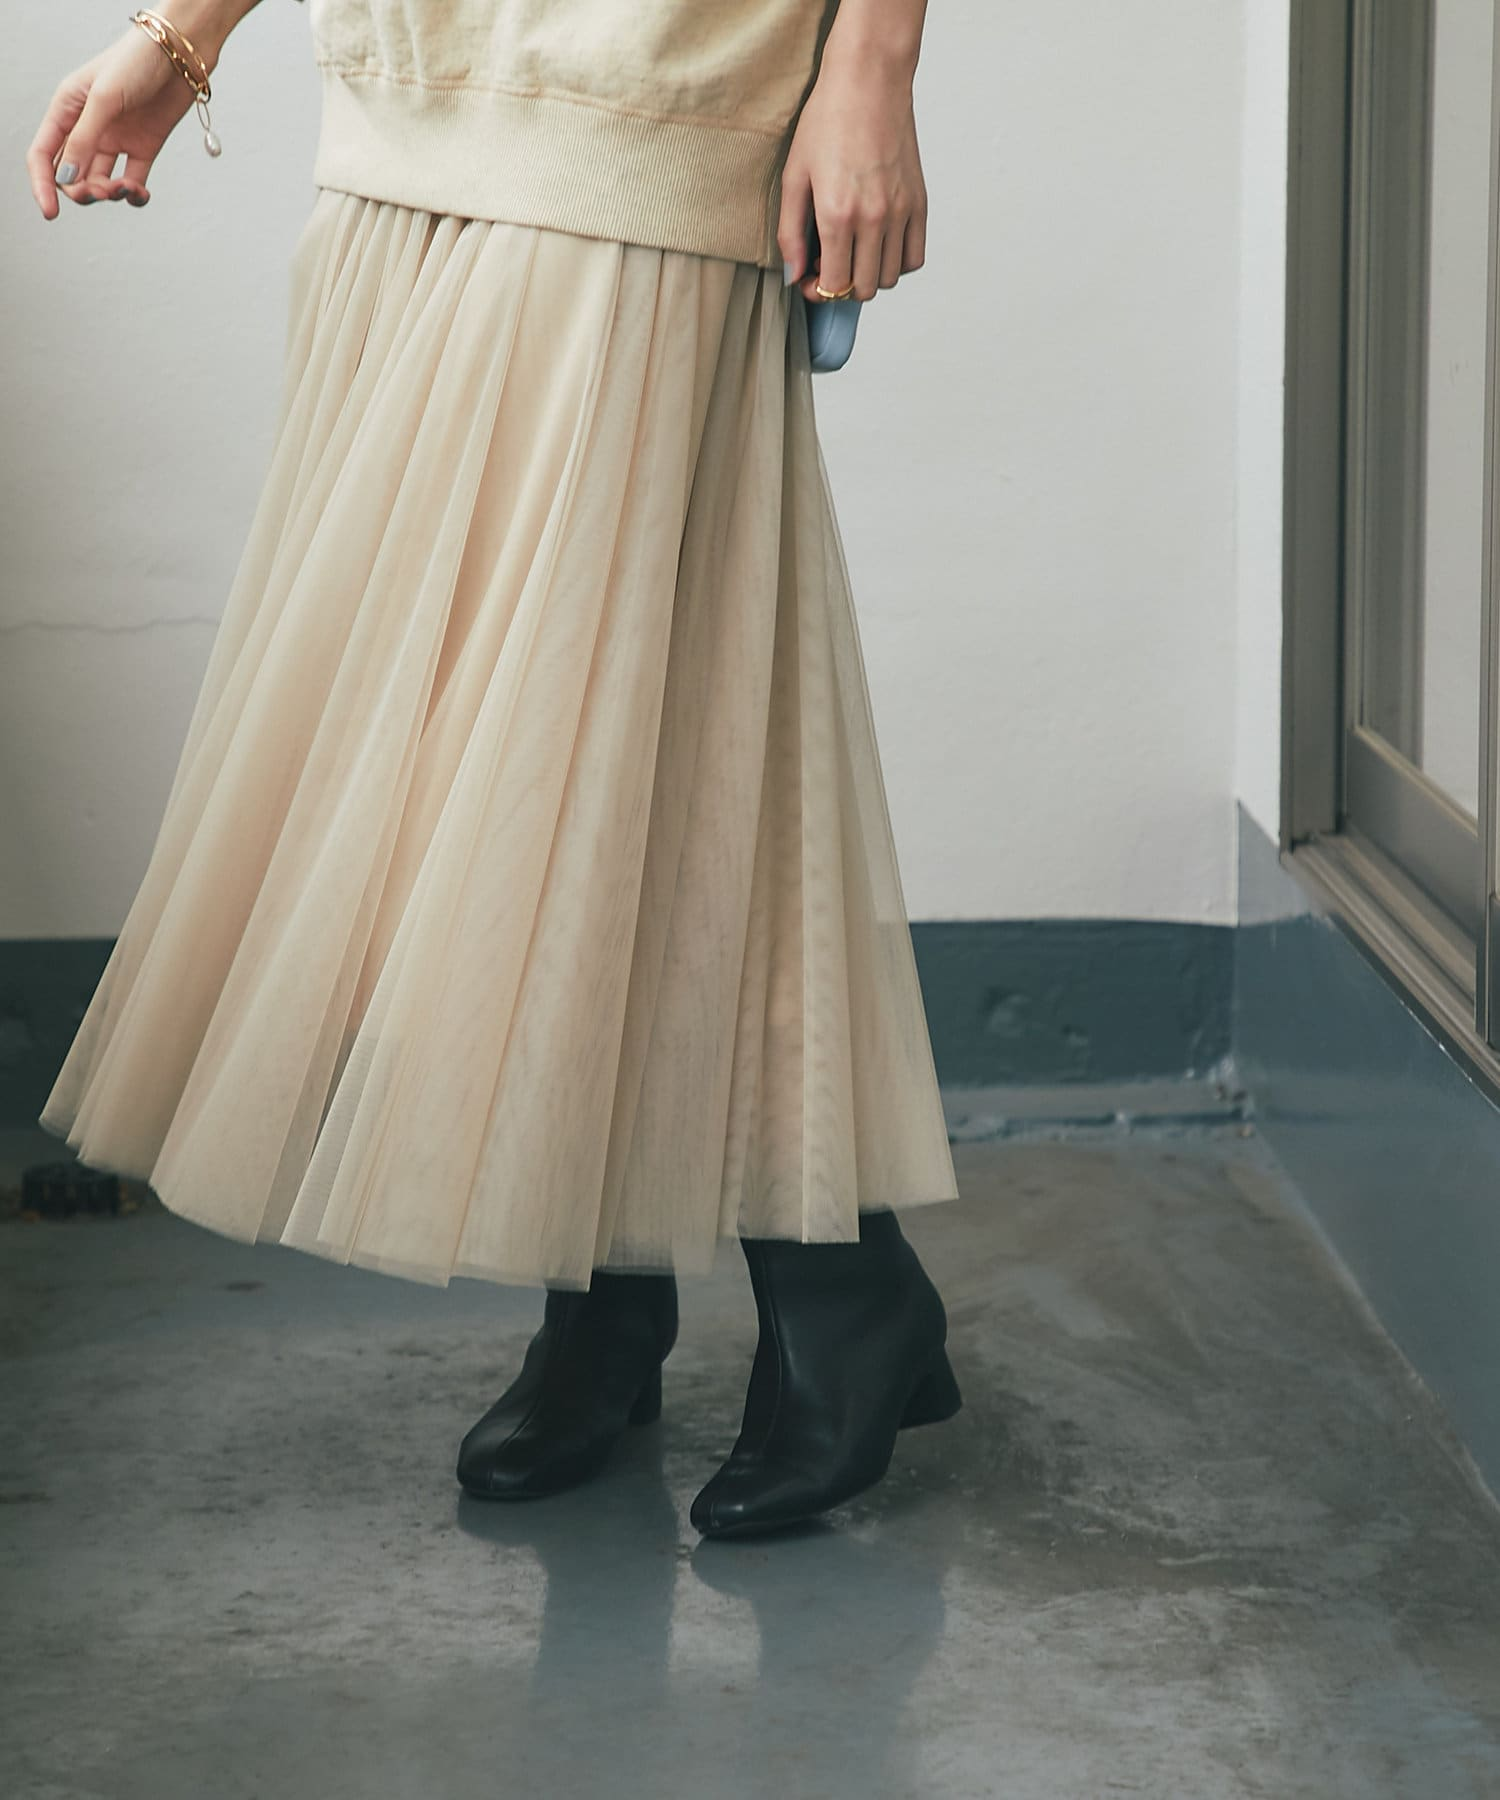 un dix cors(アンディコール) 【軽やかで女性らしい雰囲気に】ソフトチュールスカート